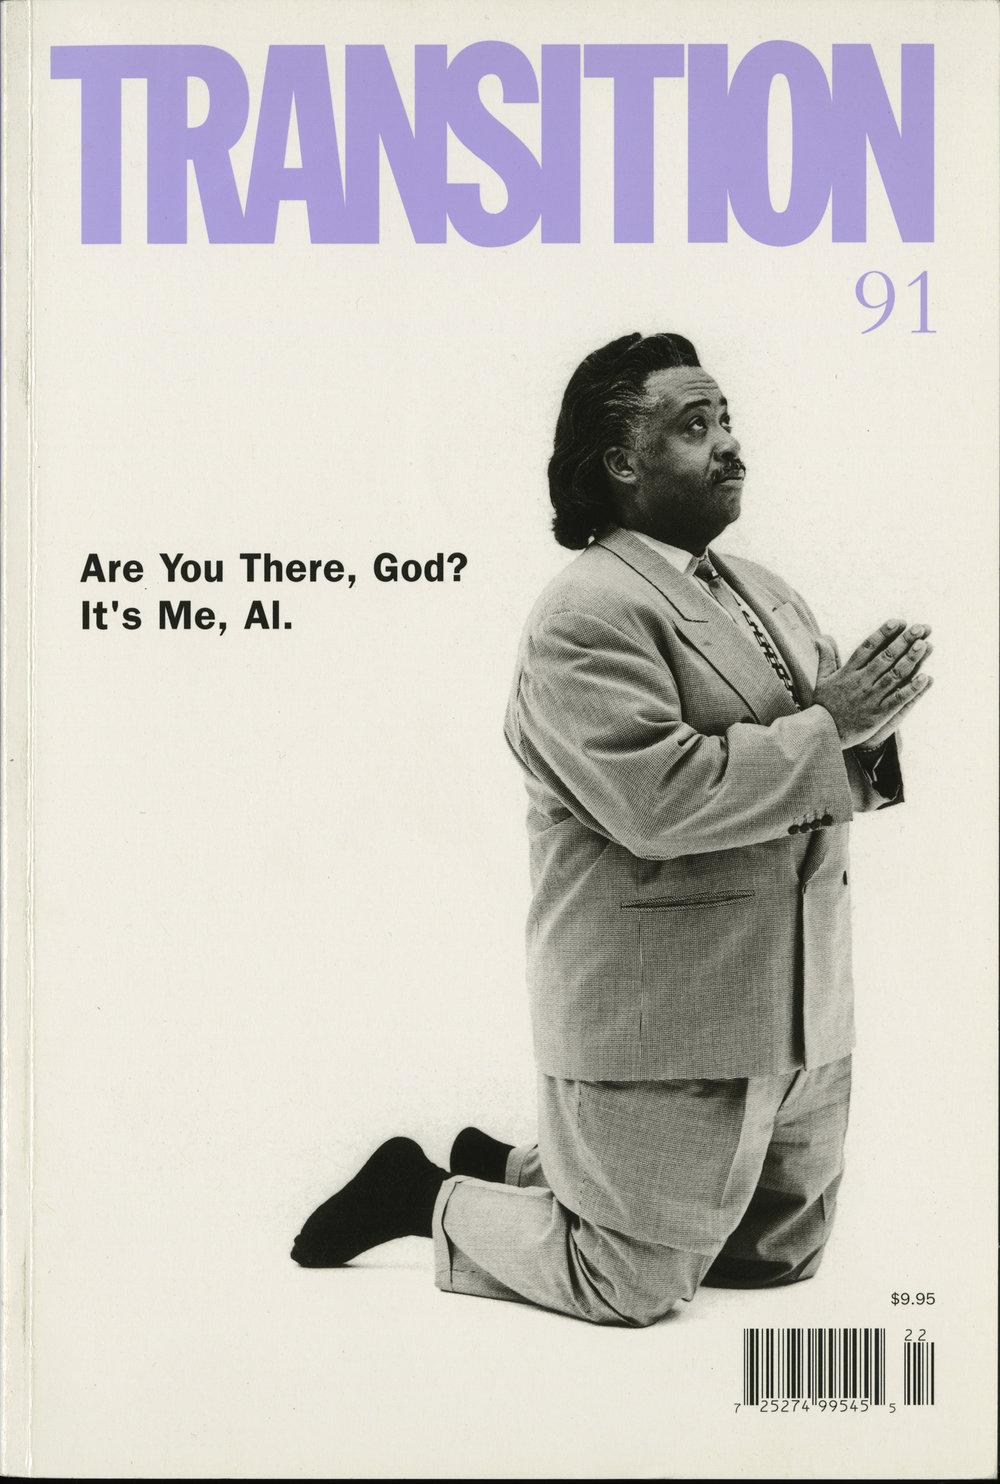 Transition (God, Inc.)